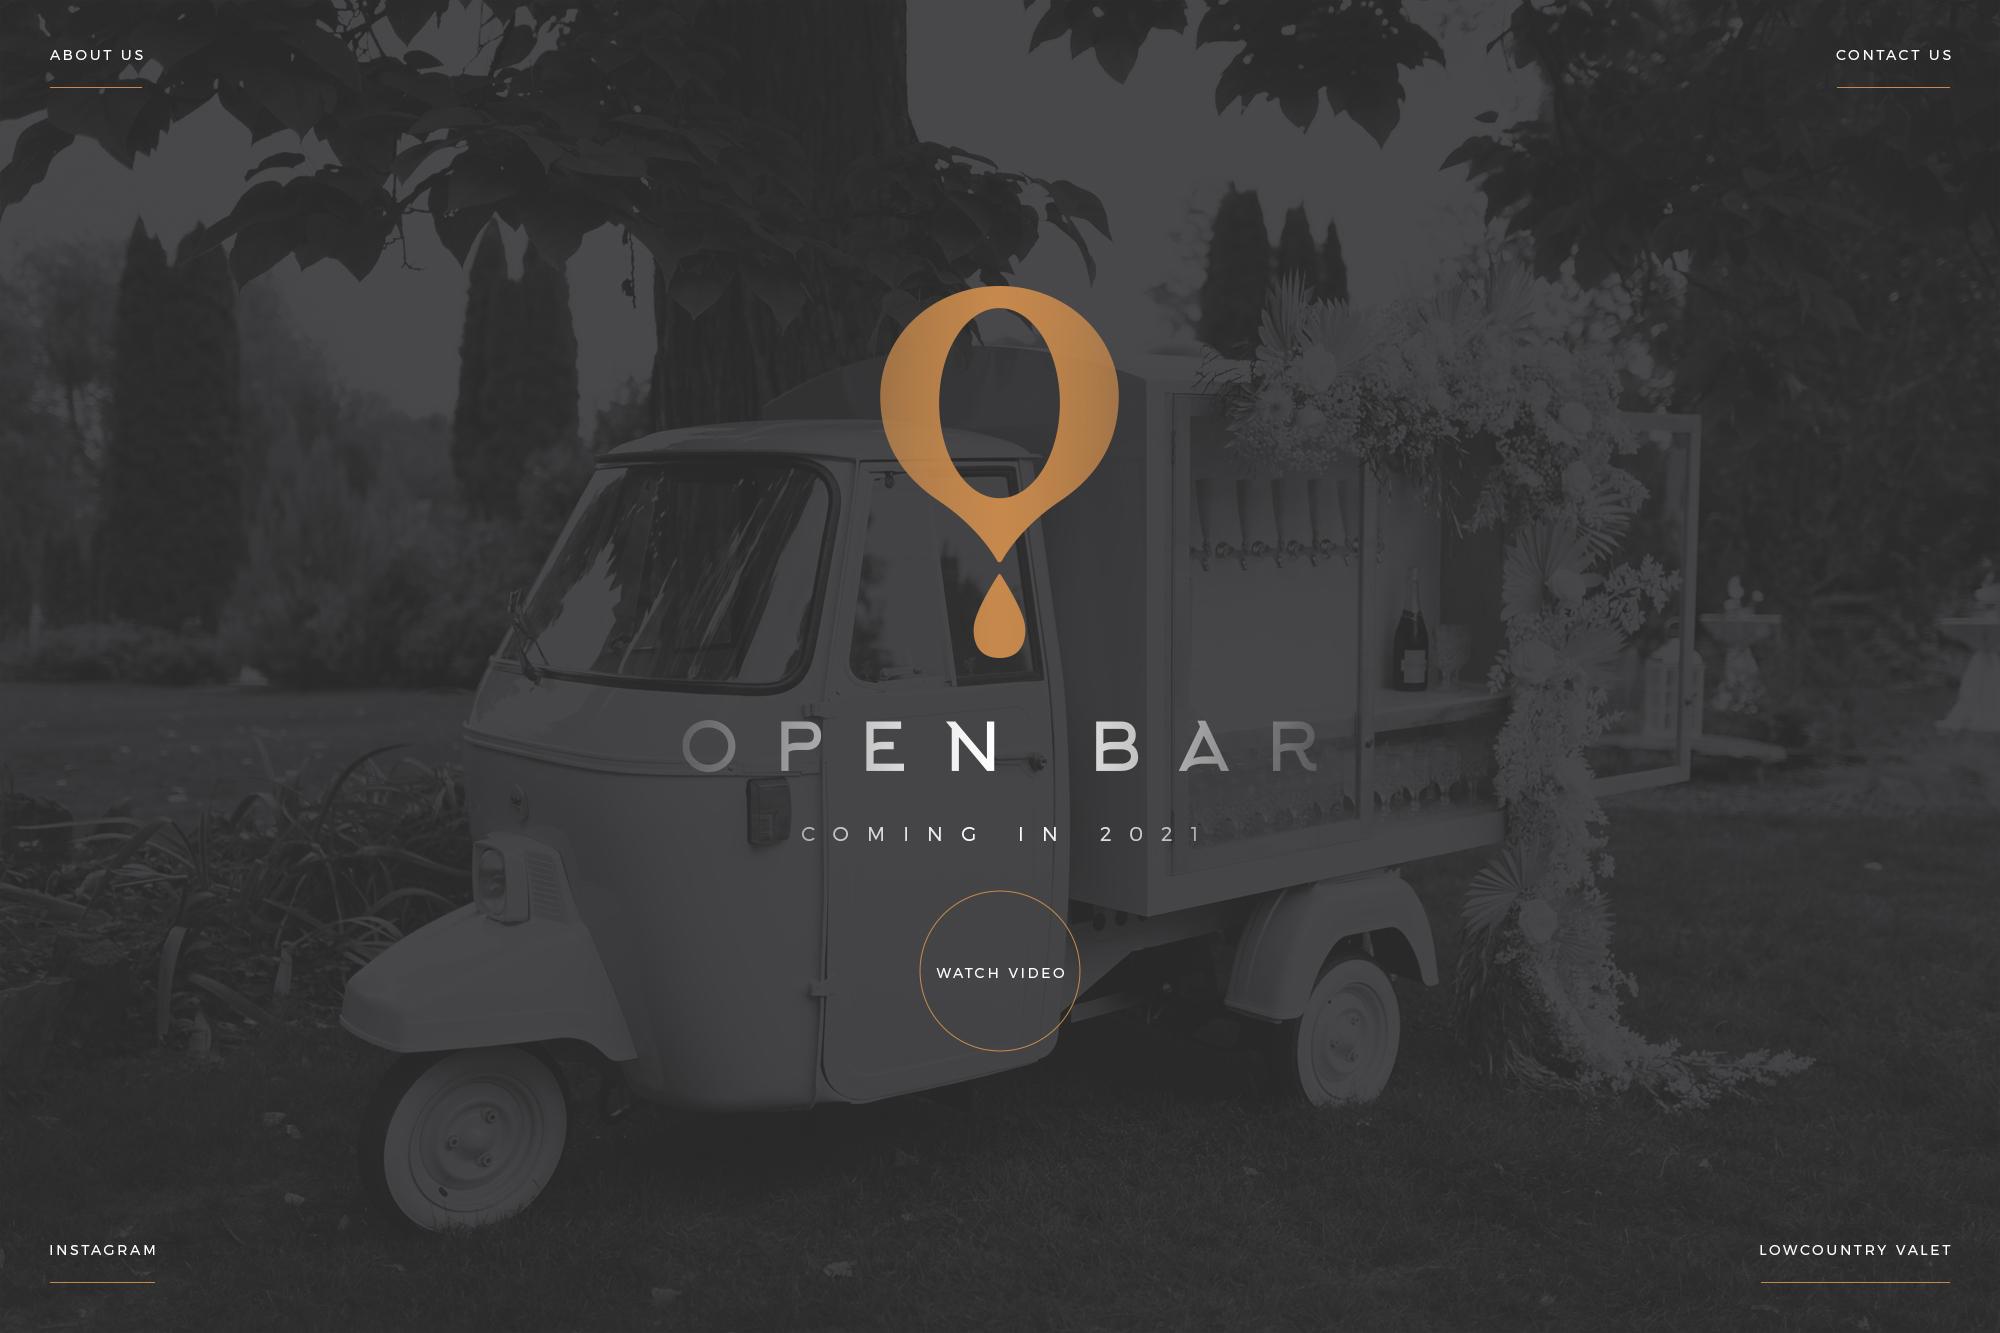 Open Bar Landing Page